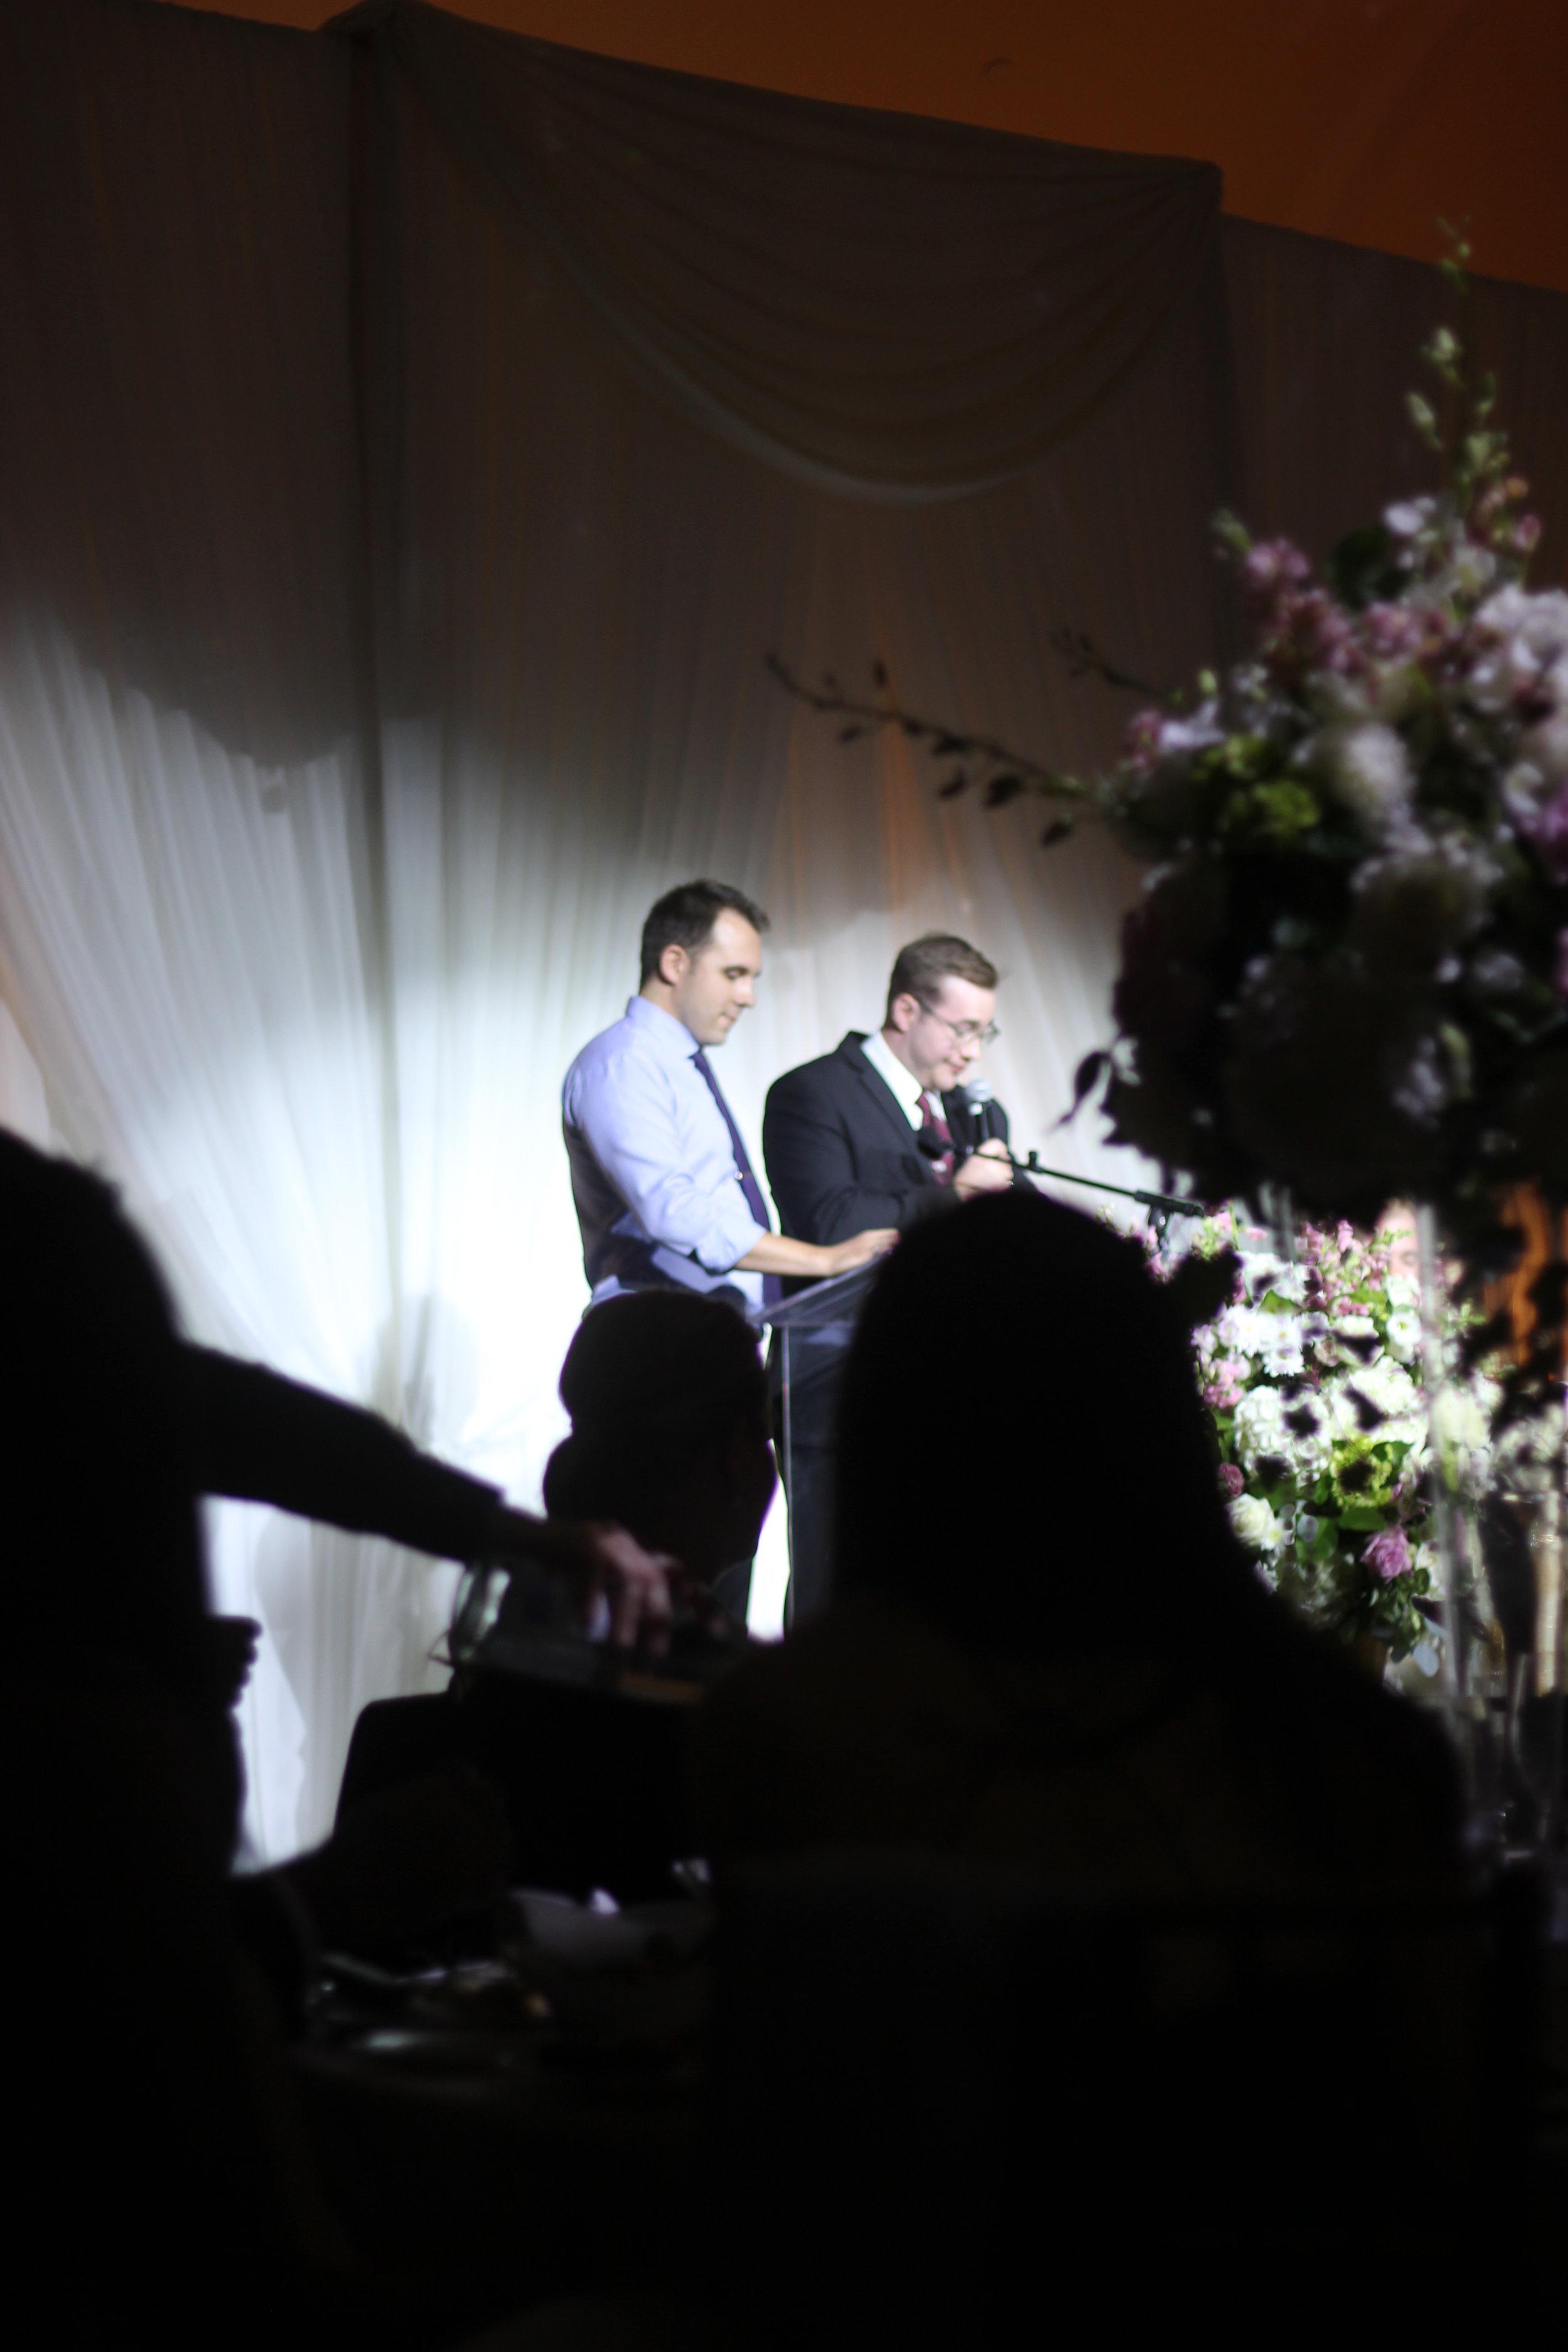 Hana's wedding 337.JPG